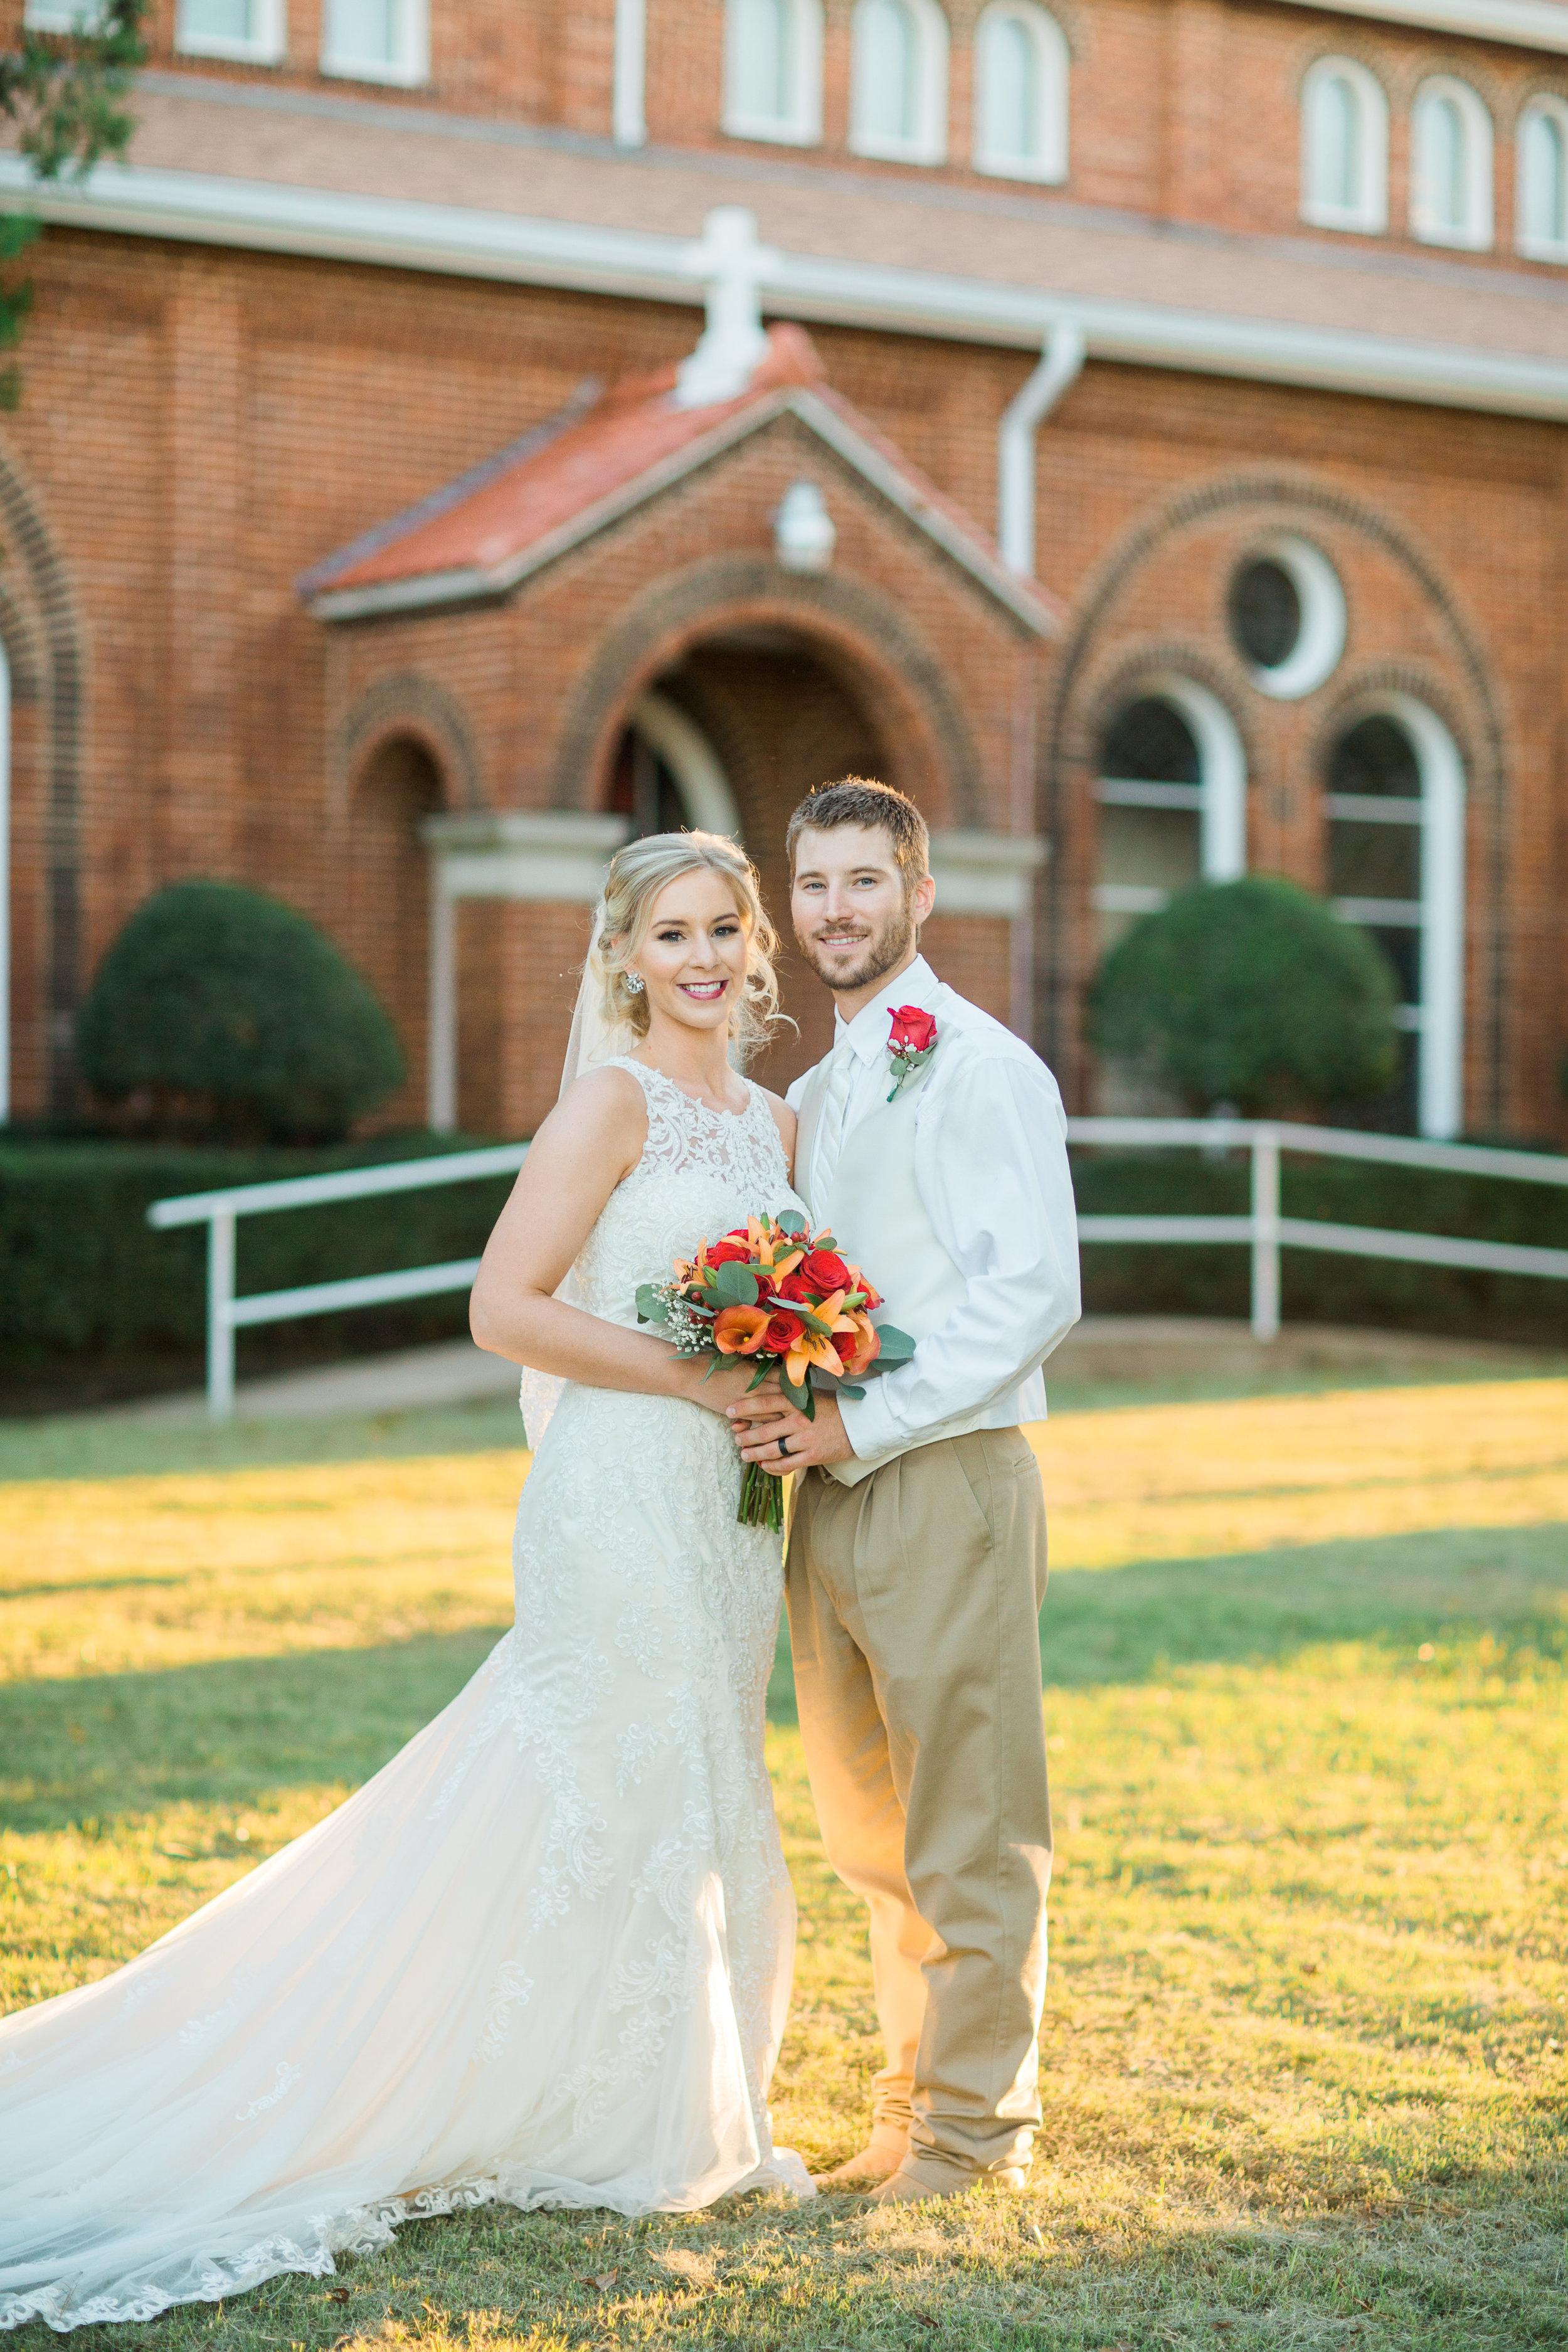 Bailey-Nathan-Windthorst-Texas-Wedding-049.jpg